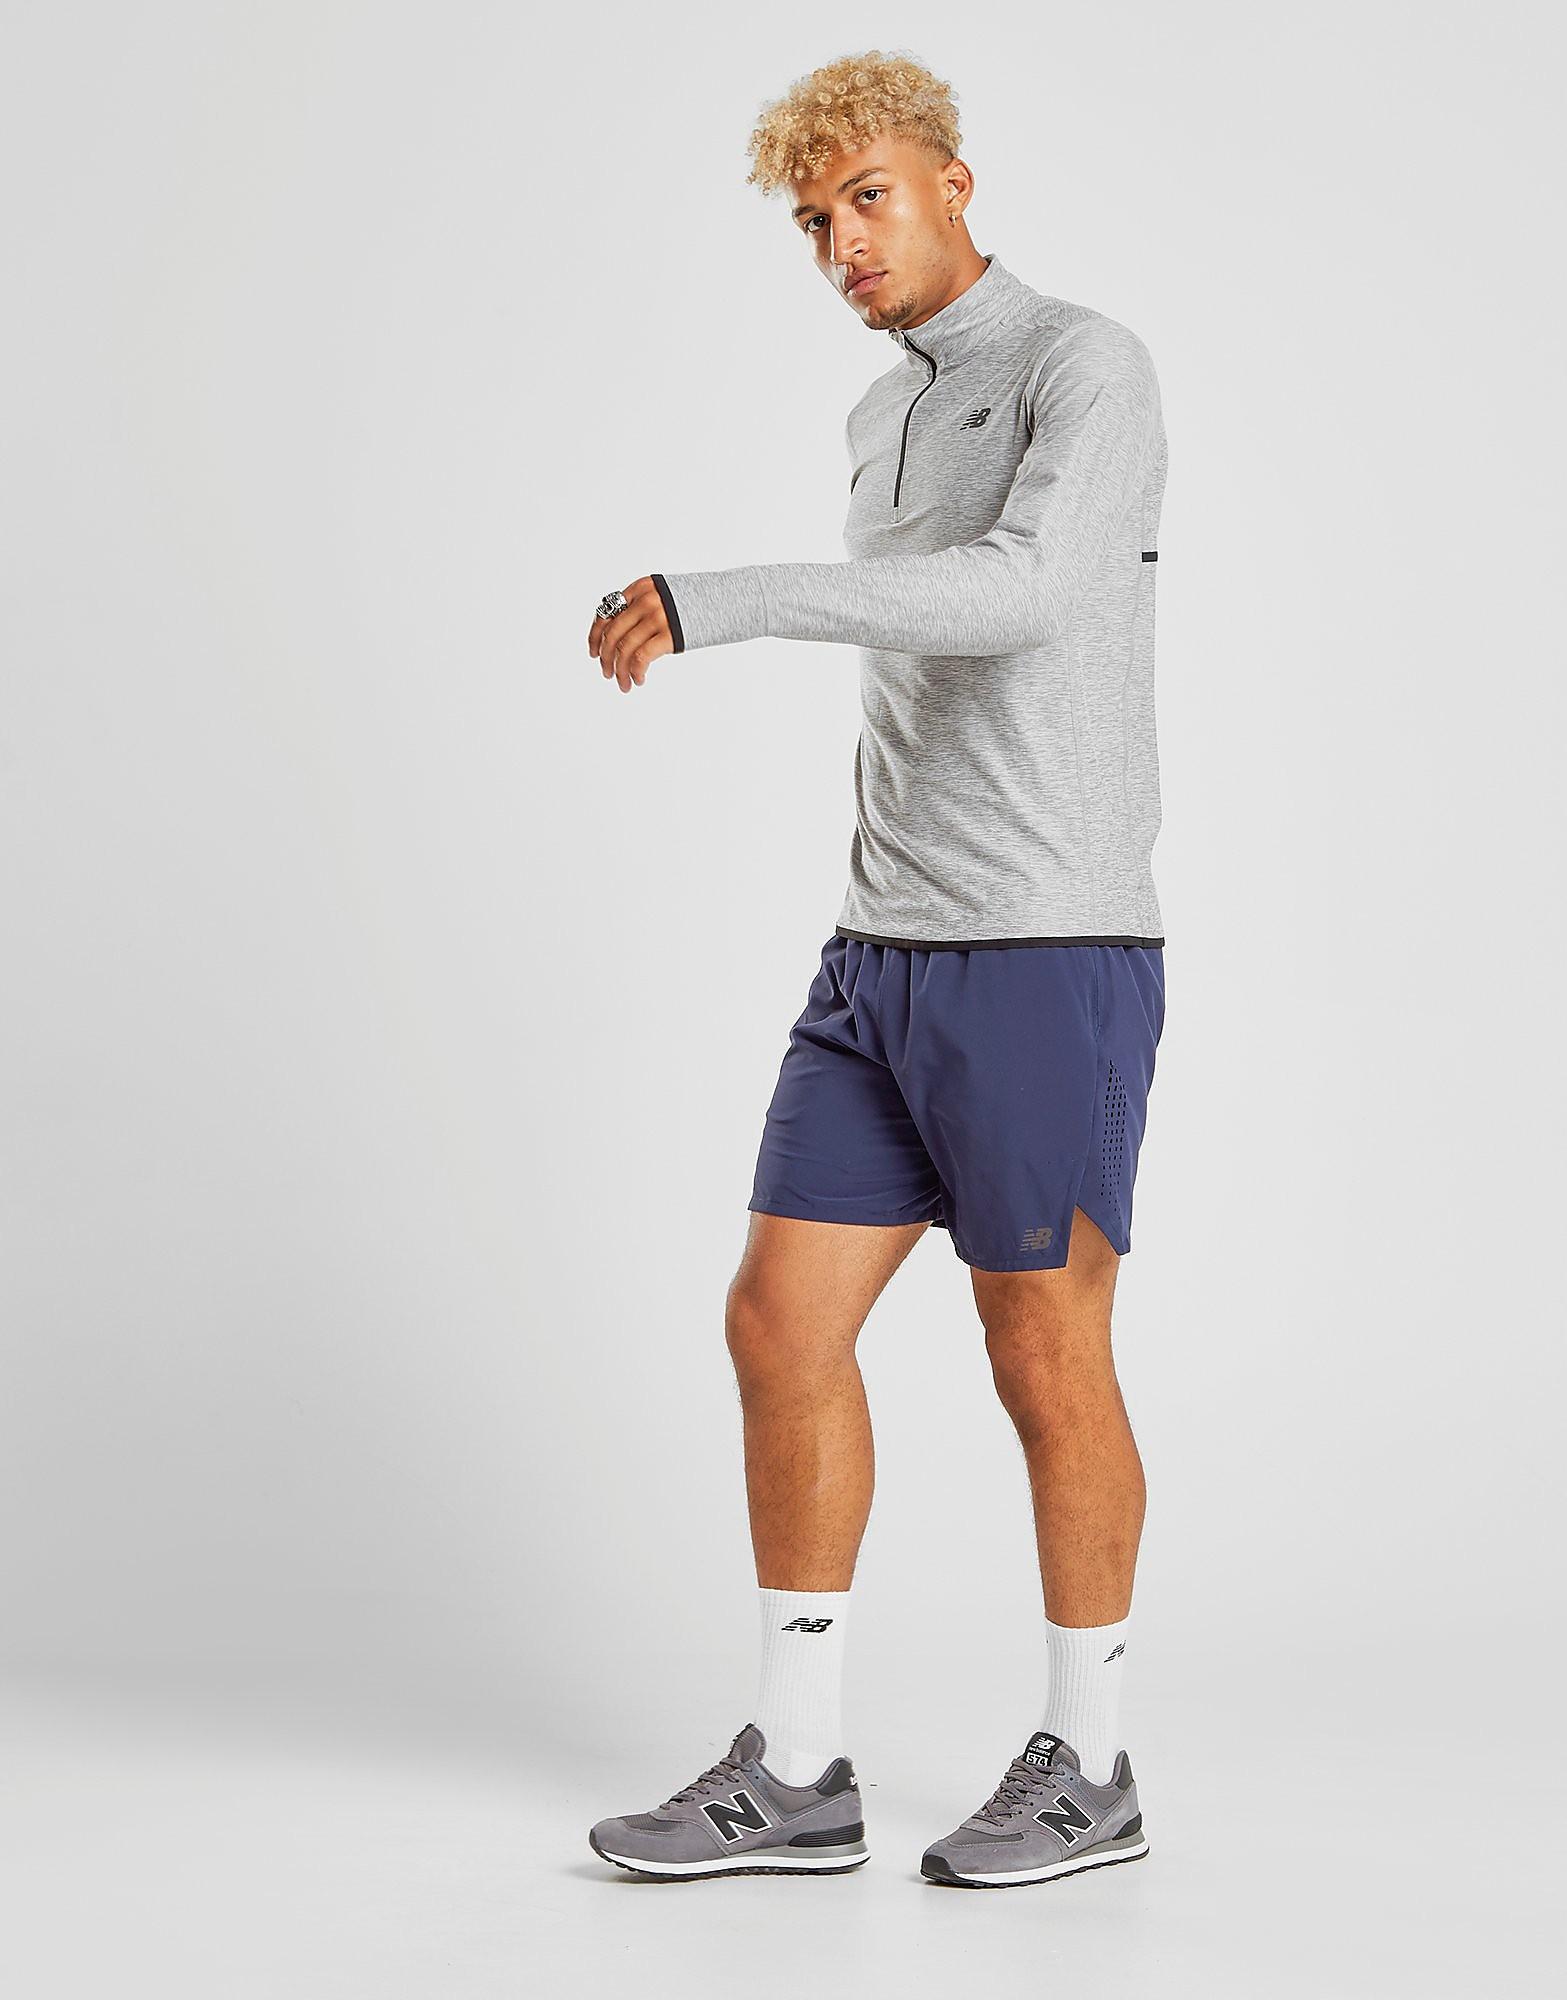 New Balance Transform 2-in-1 Shorts Heren - Blauw - Heren